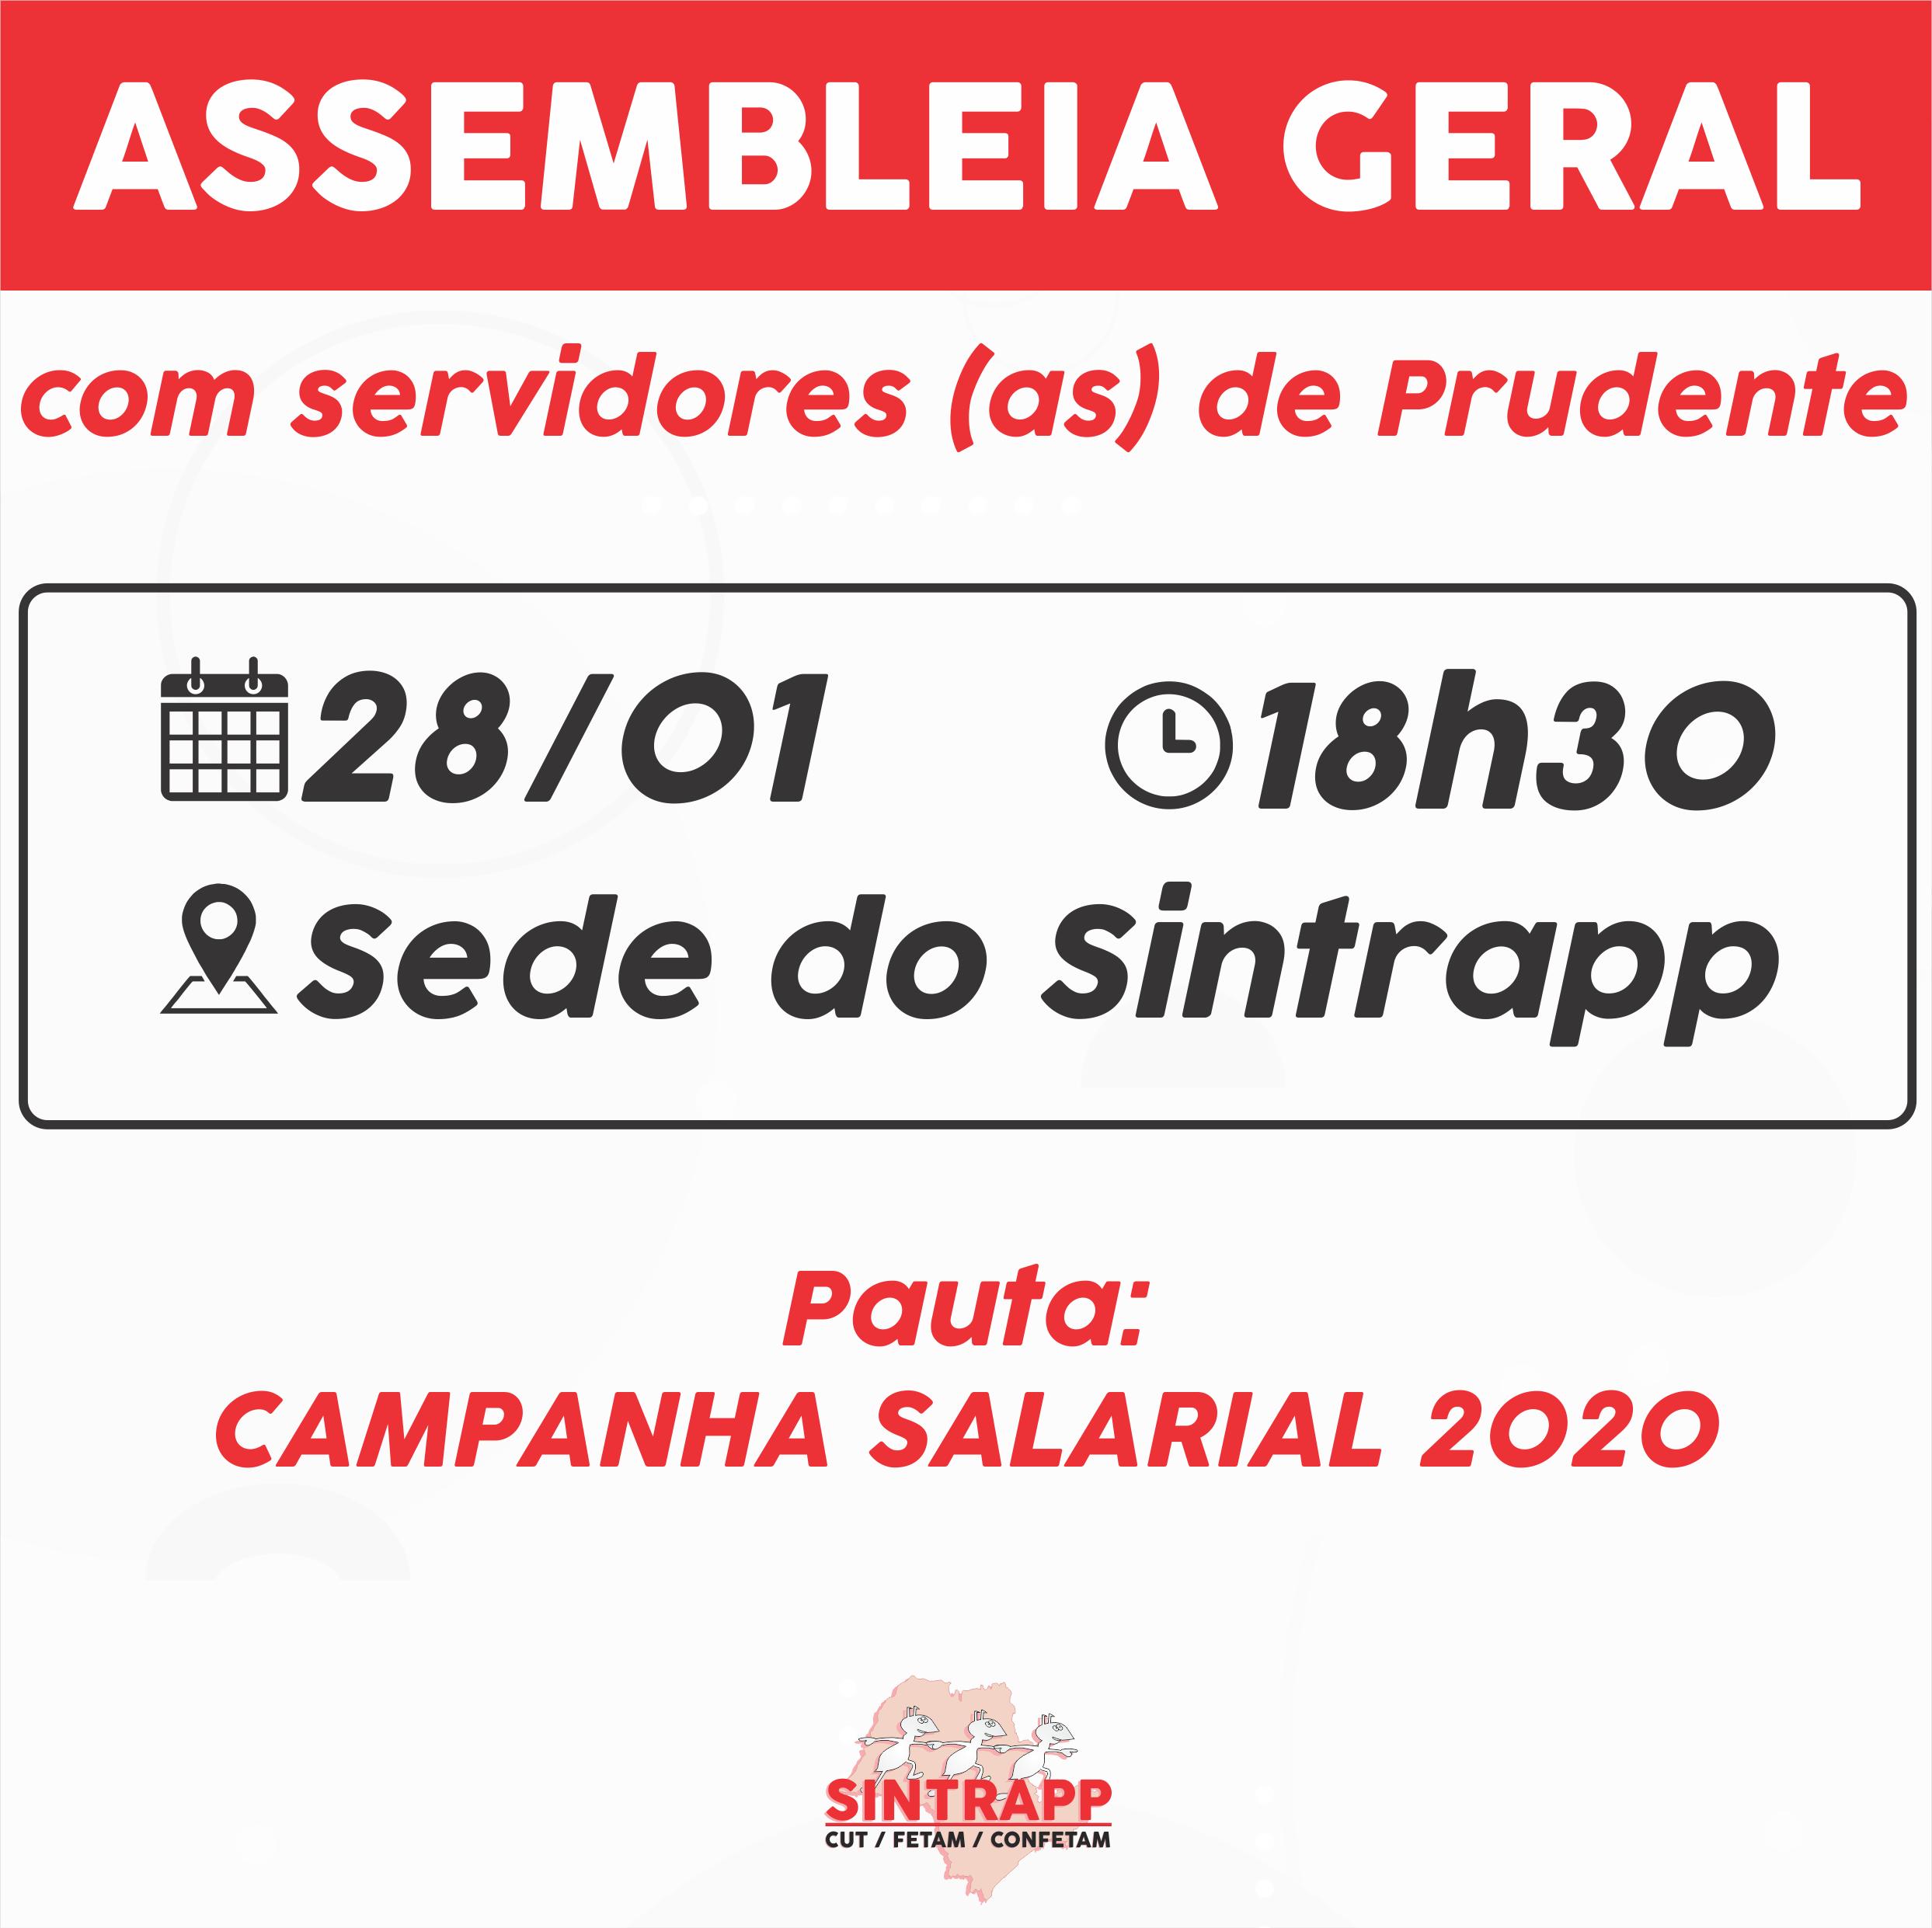 Sindicato convoca assembleia para campanha salarial 2020